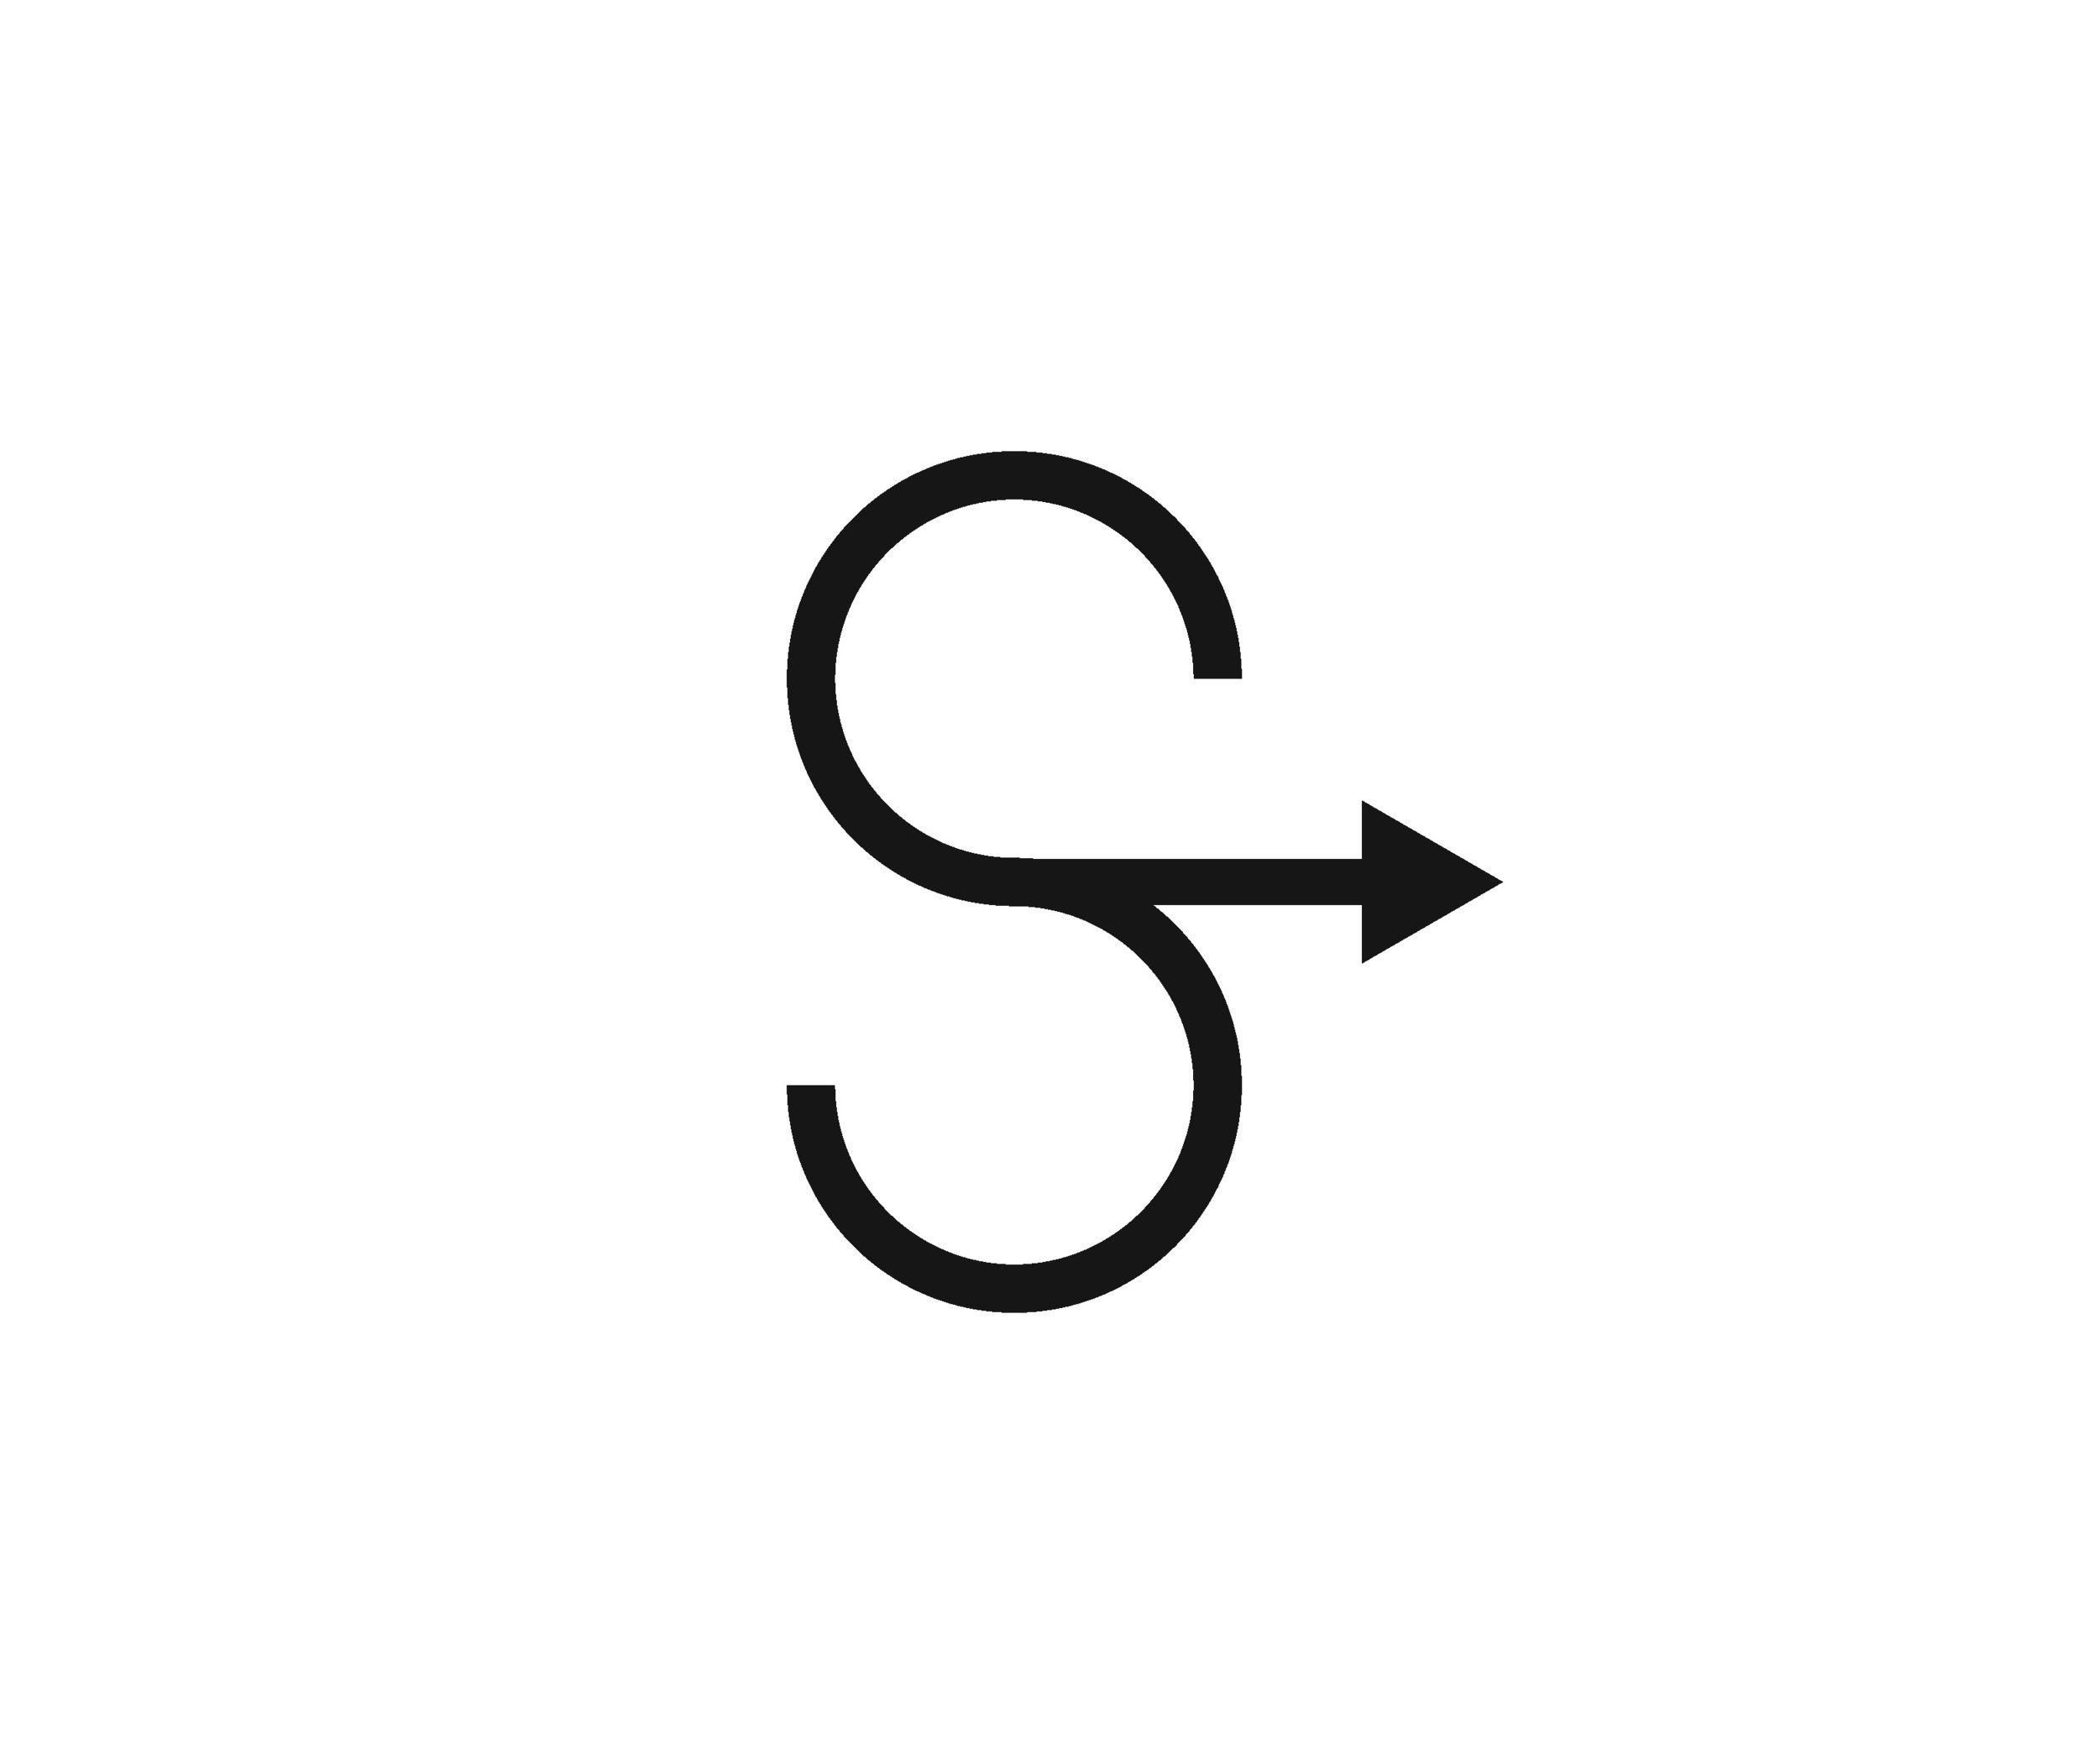 Stride Search identity logo concepts 2 arrow